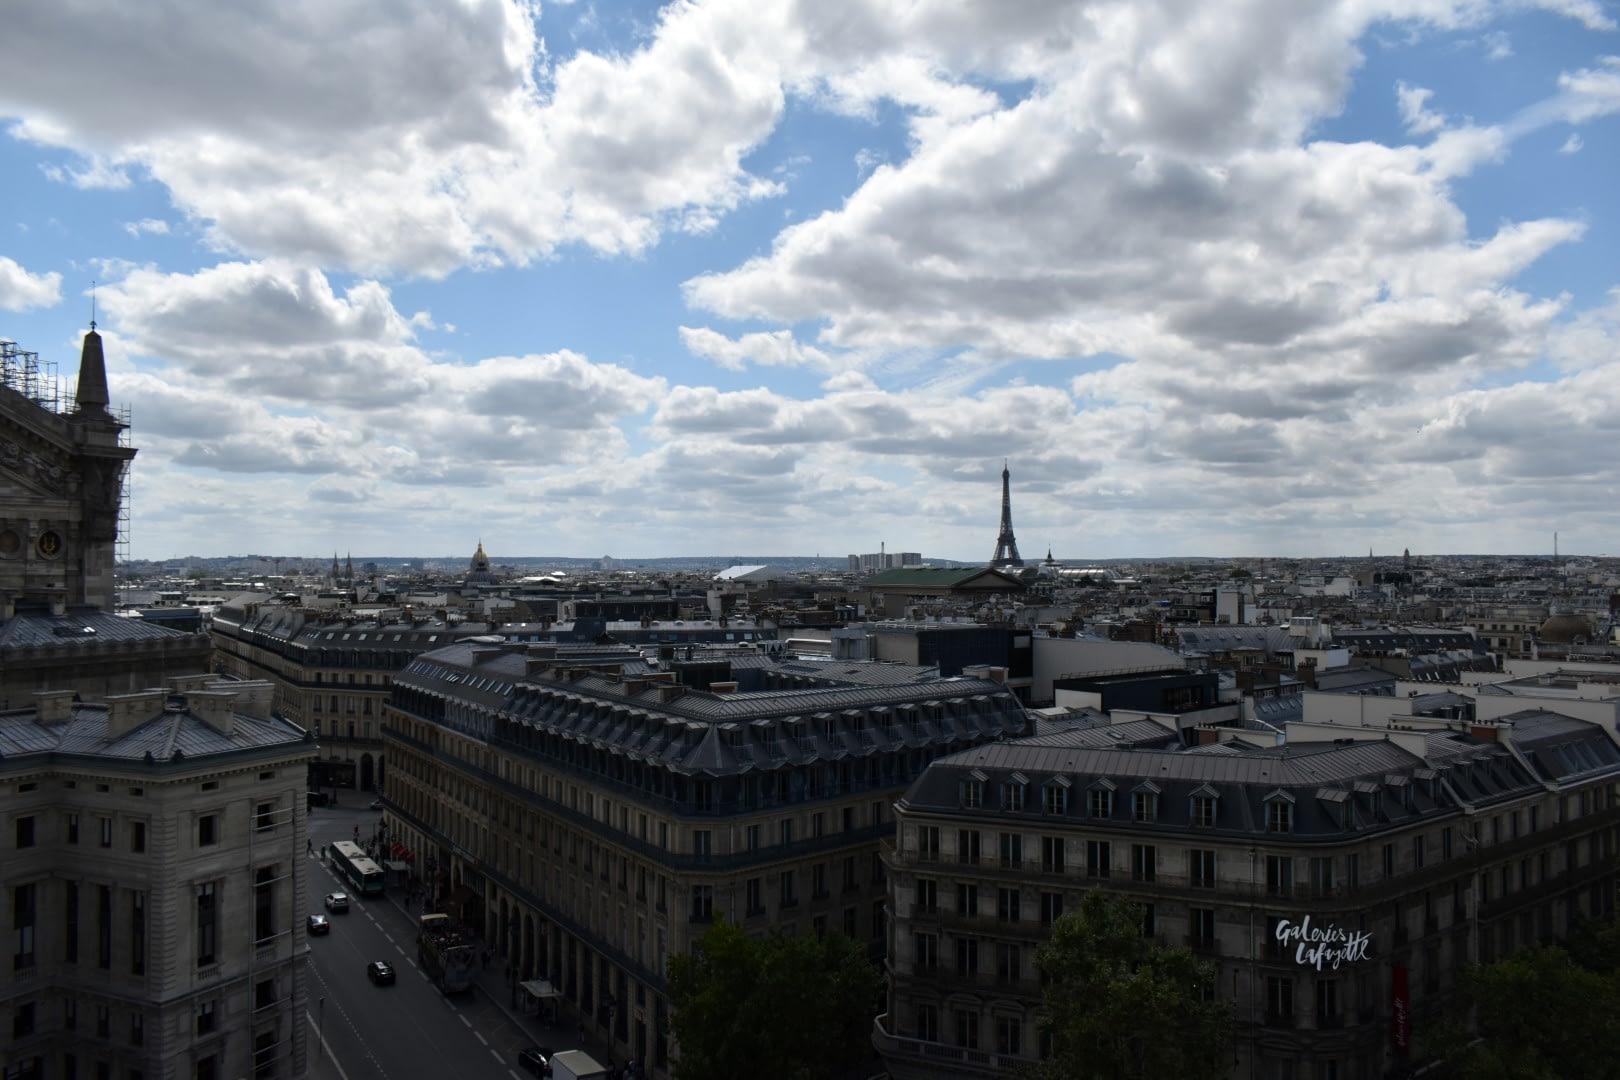 Galeries Lafayette Haussmann, 40 Bd Haussmann, Paris